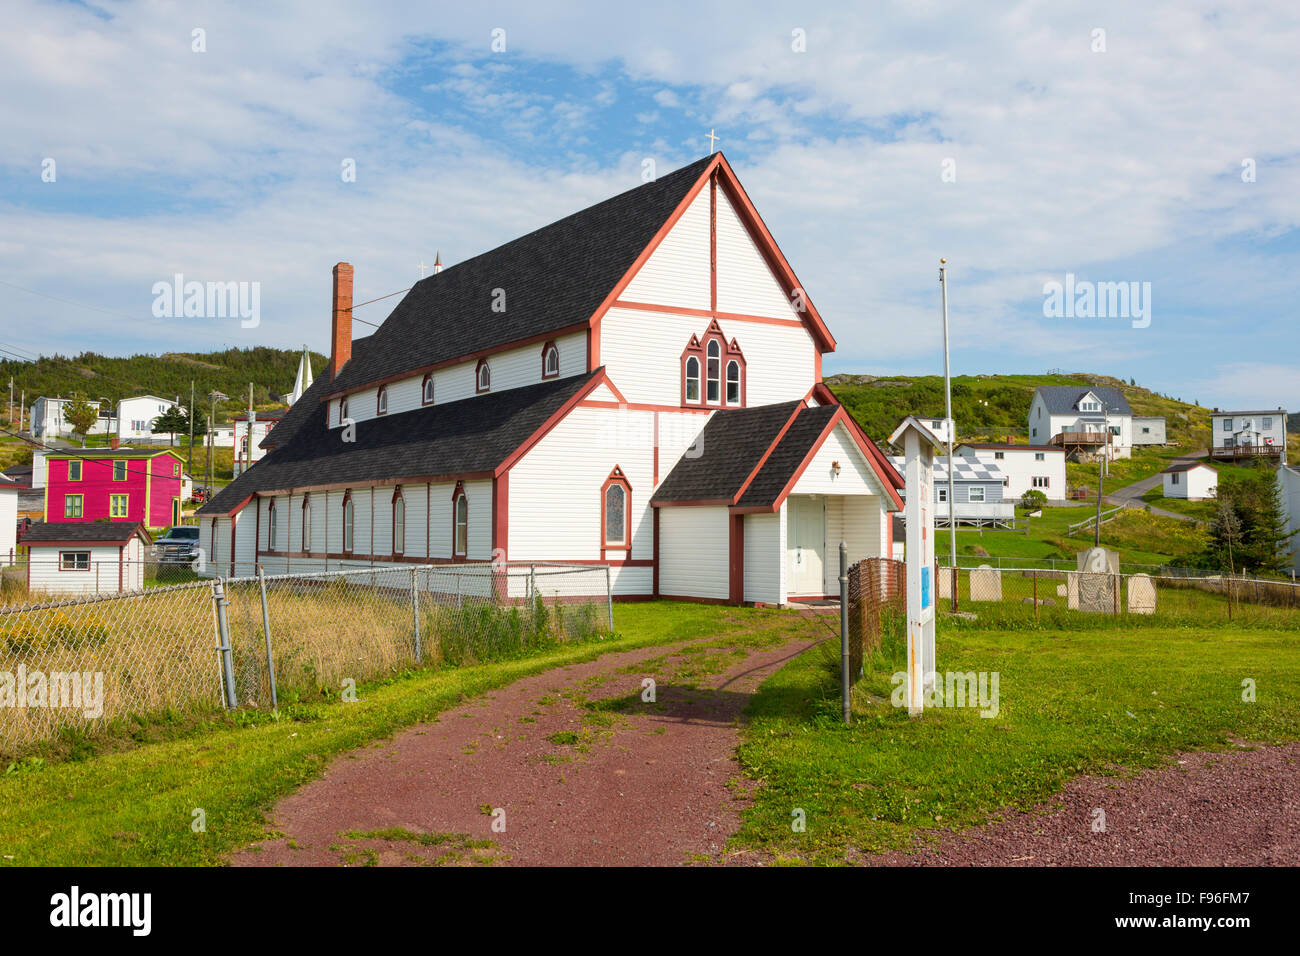 St. Luke's Anglican Church, Winterton, Newfoundland, Canada - Stock Image